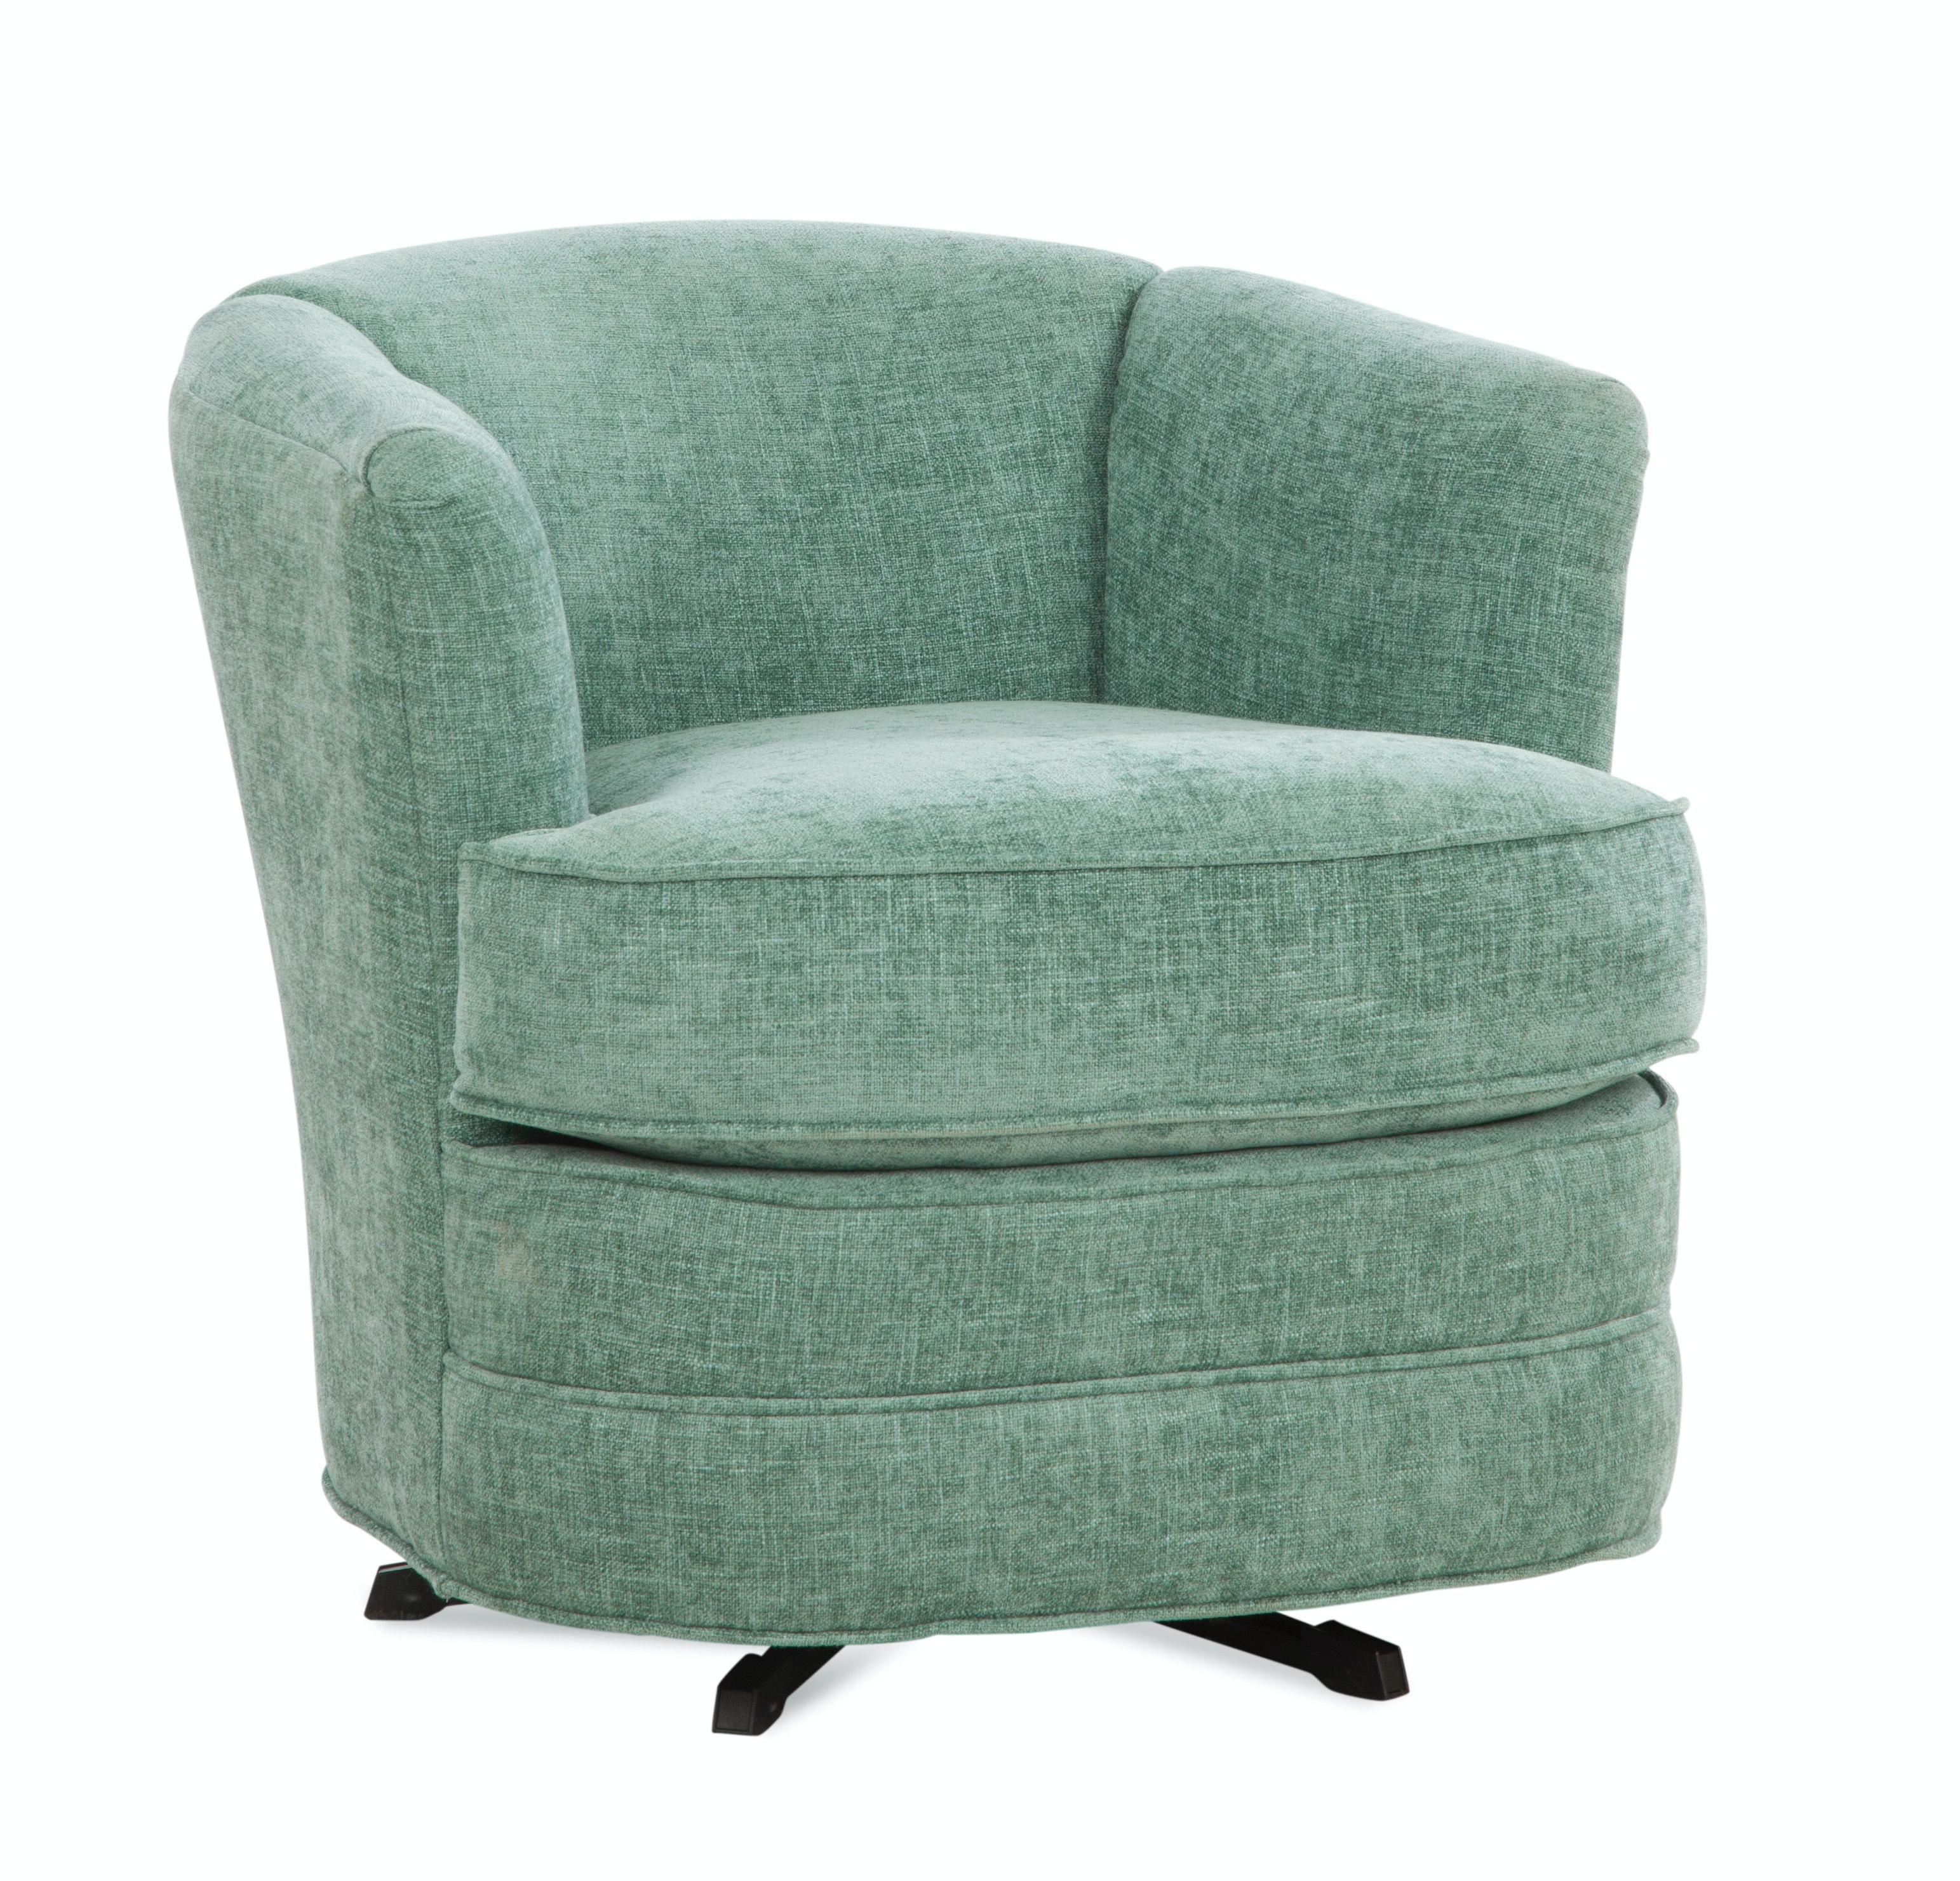 swivel tub chairs modern chair design living room braxton culler greyson 549 005 turner